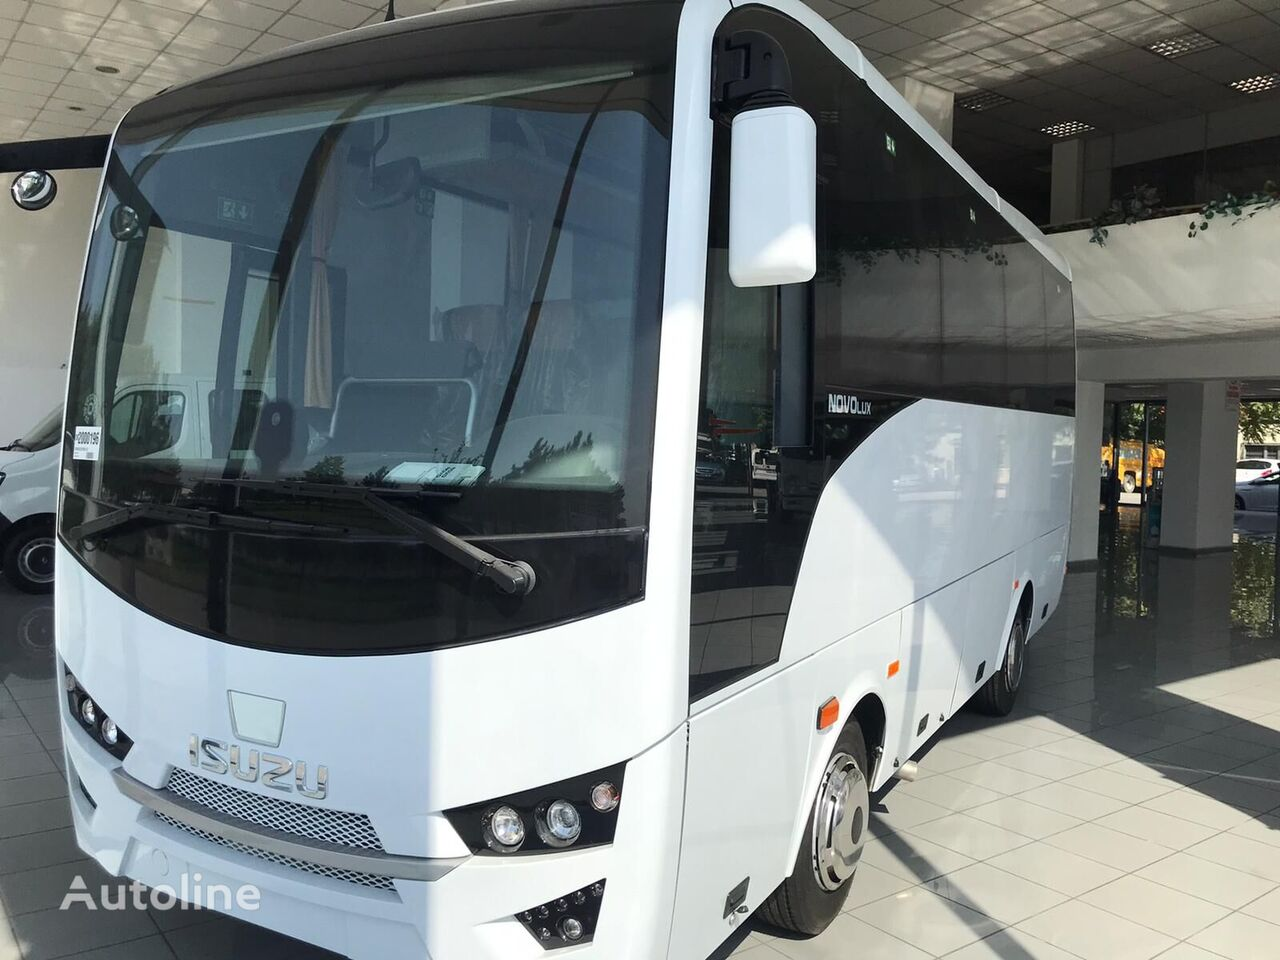 Купить туристический автобус ISUZU Novo Lux more in stock we ship worldwide Германия Gmund am Tegernsee, JX23302